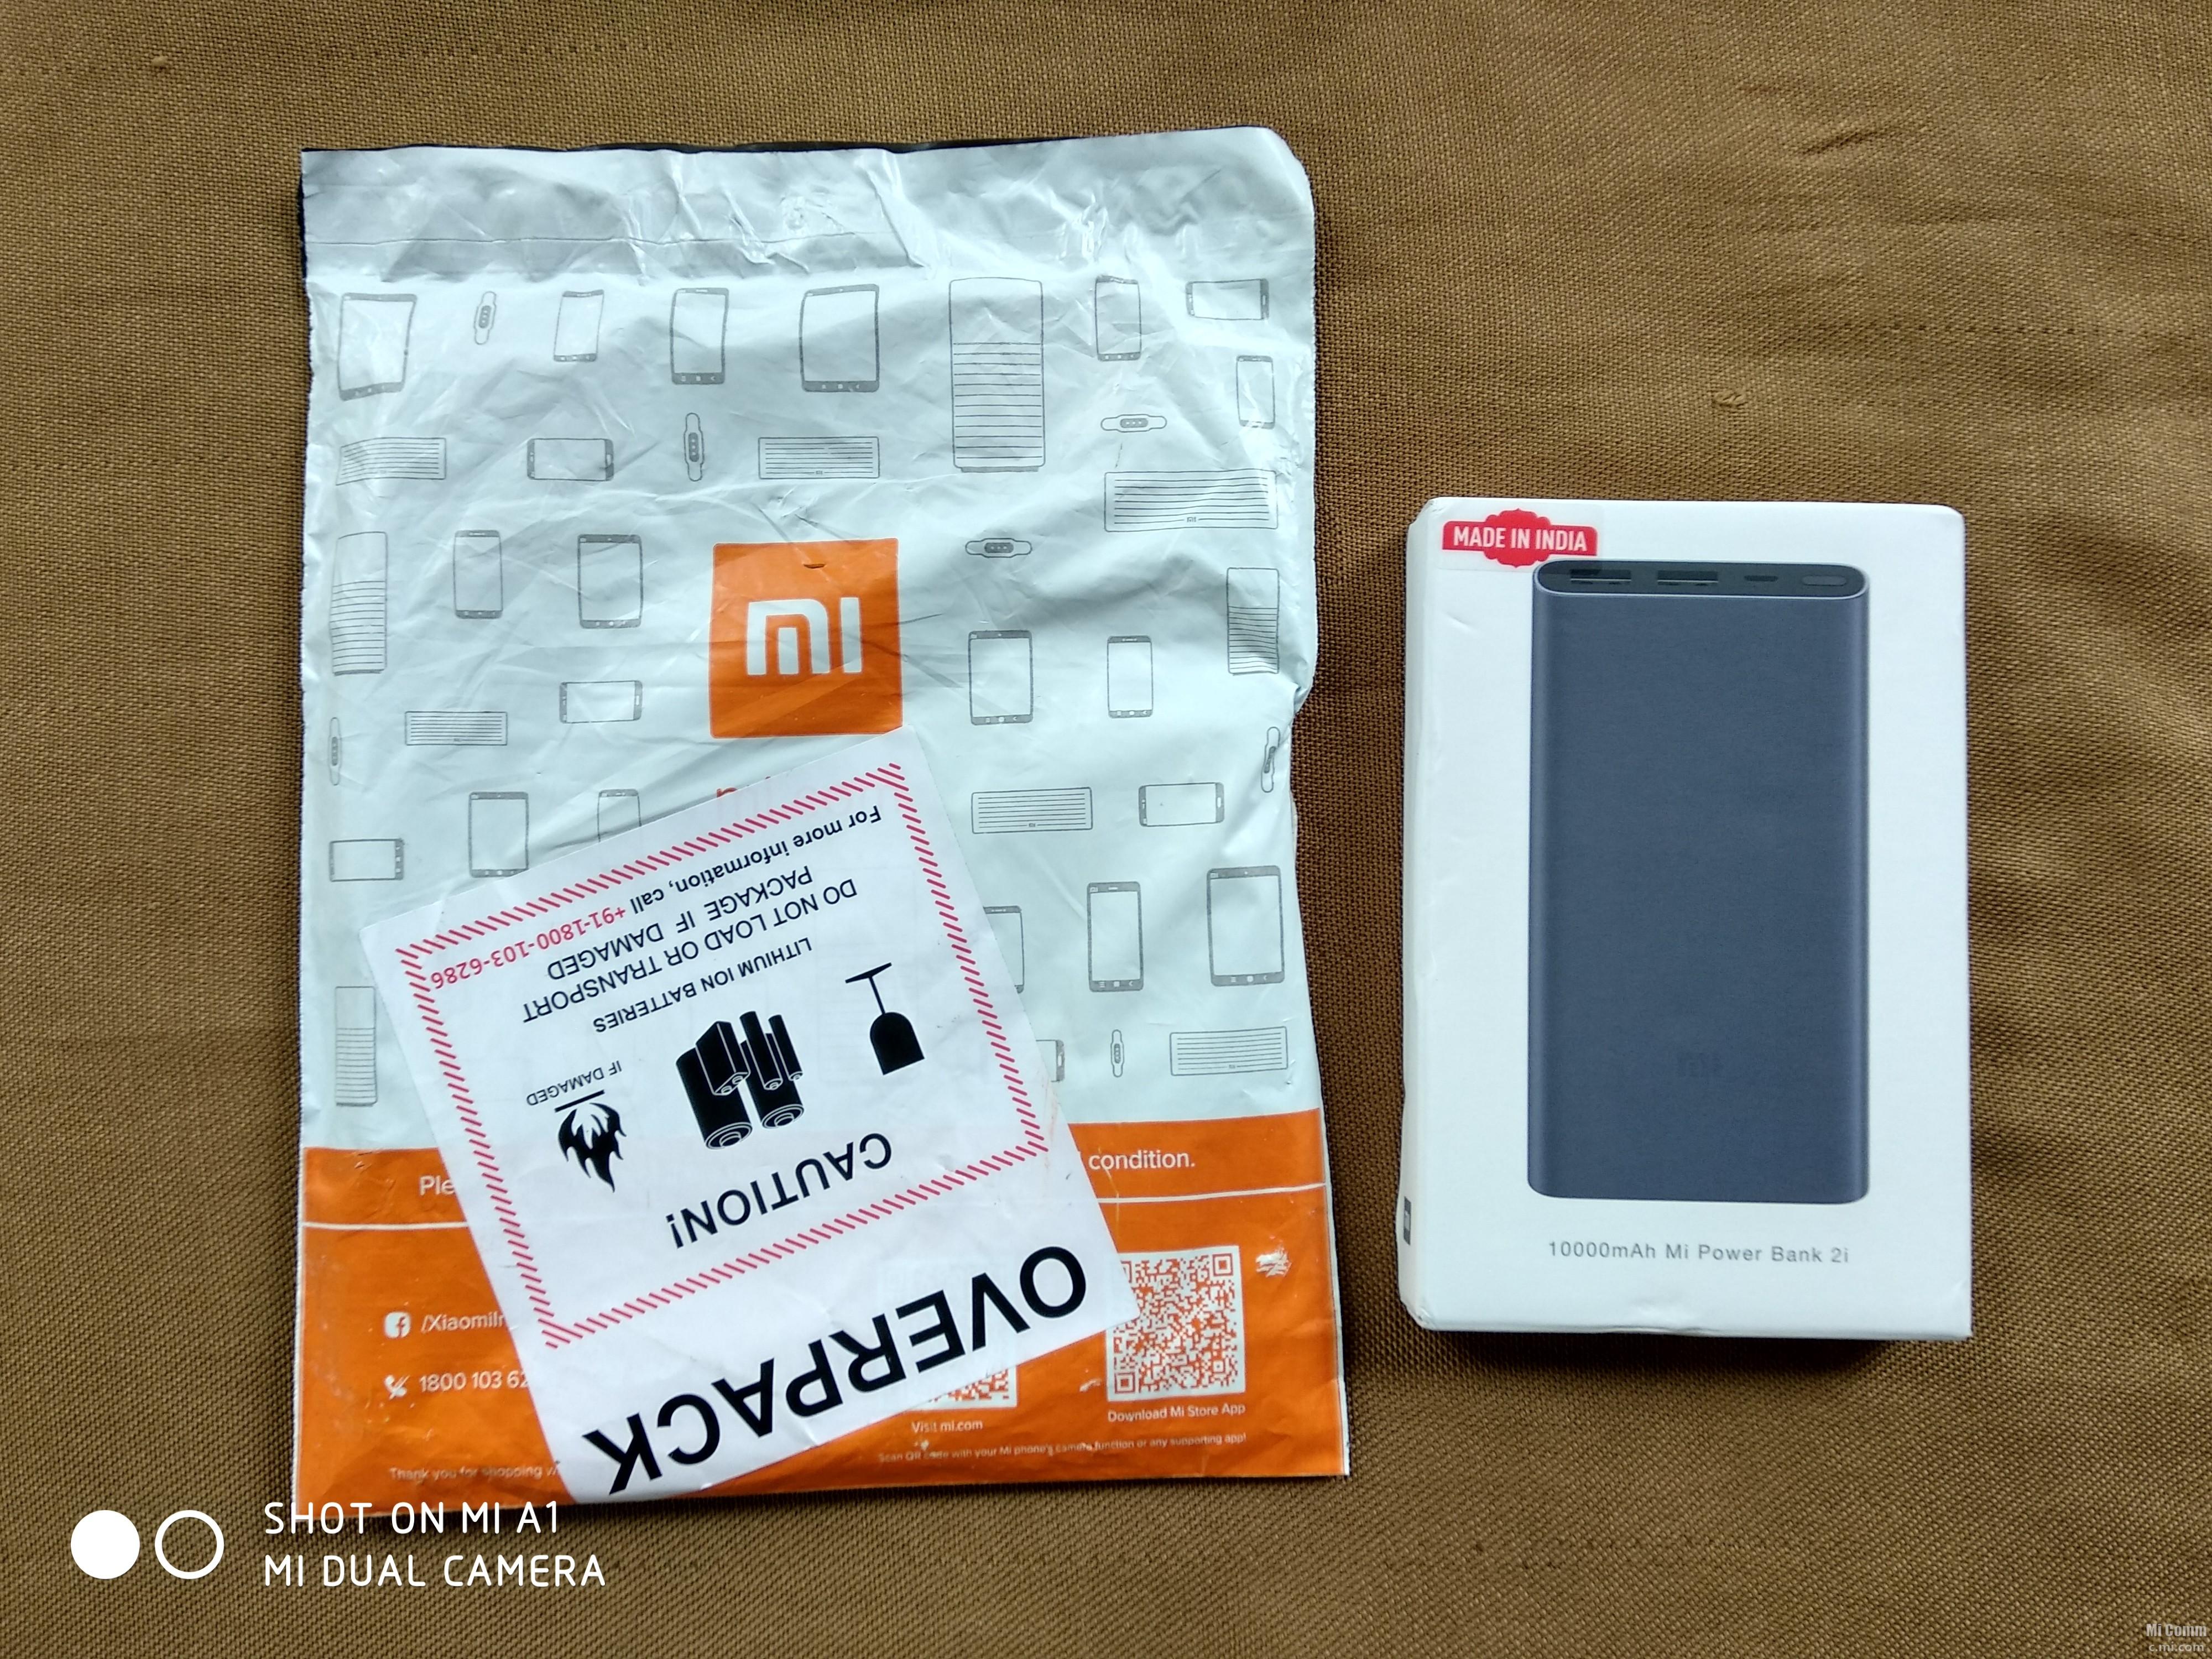 Unboxing 10000mah Mi Power Bank 2i Accessories Community Xiaomi Powerbank